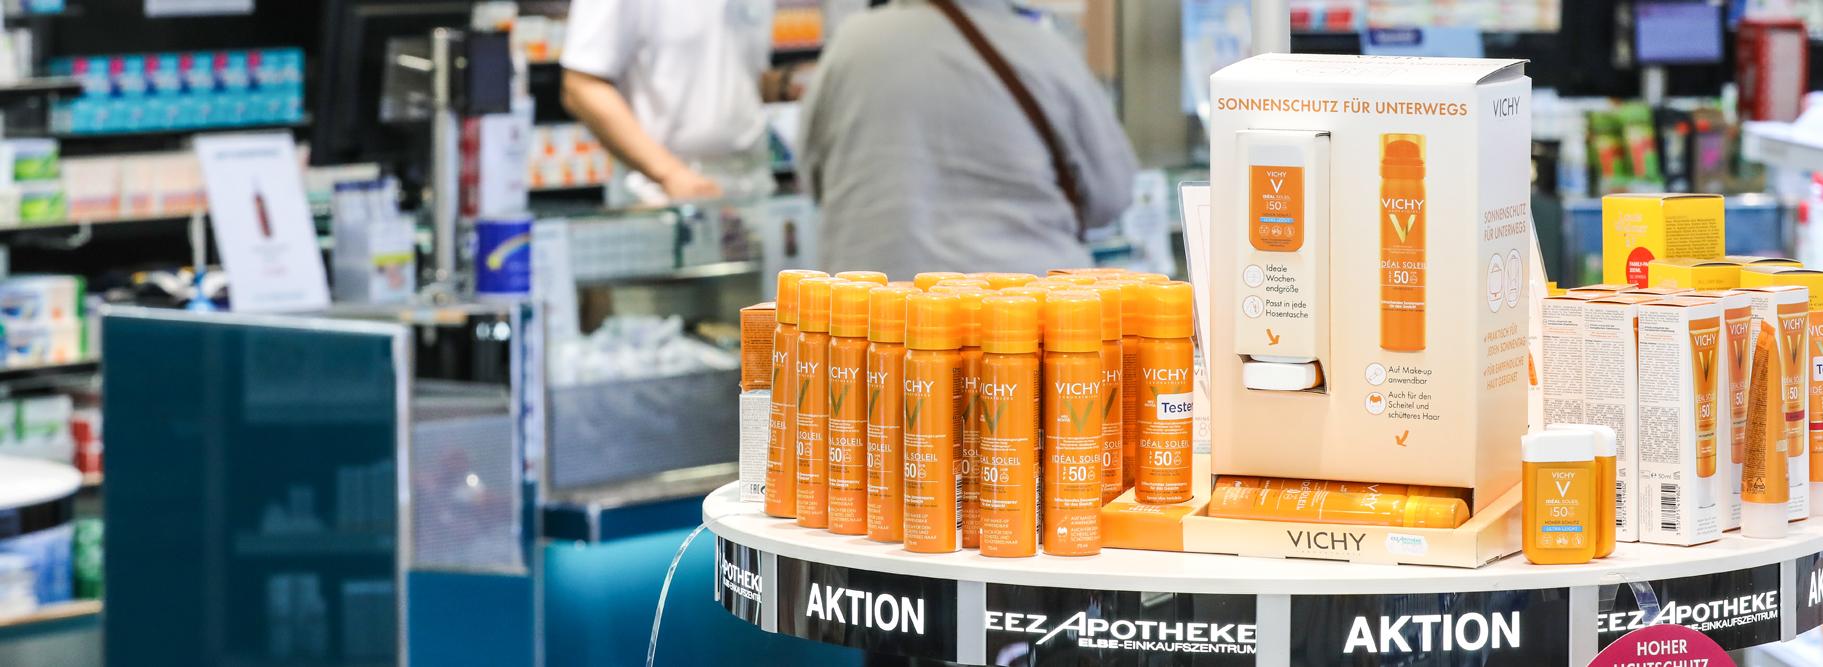 EEZ-Apotheke-Kosmetik-Sonnenschutz-Header